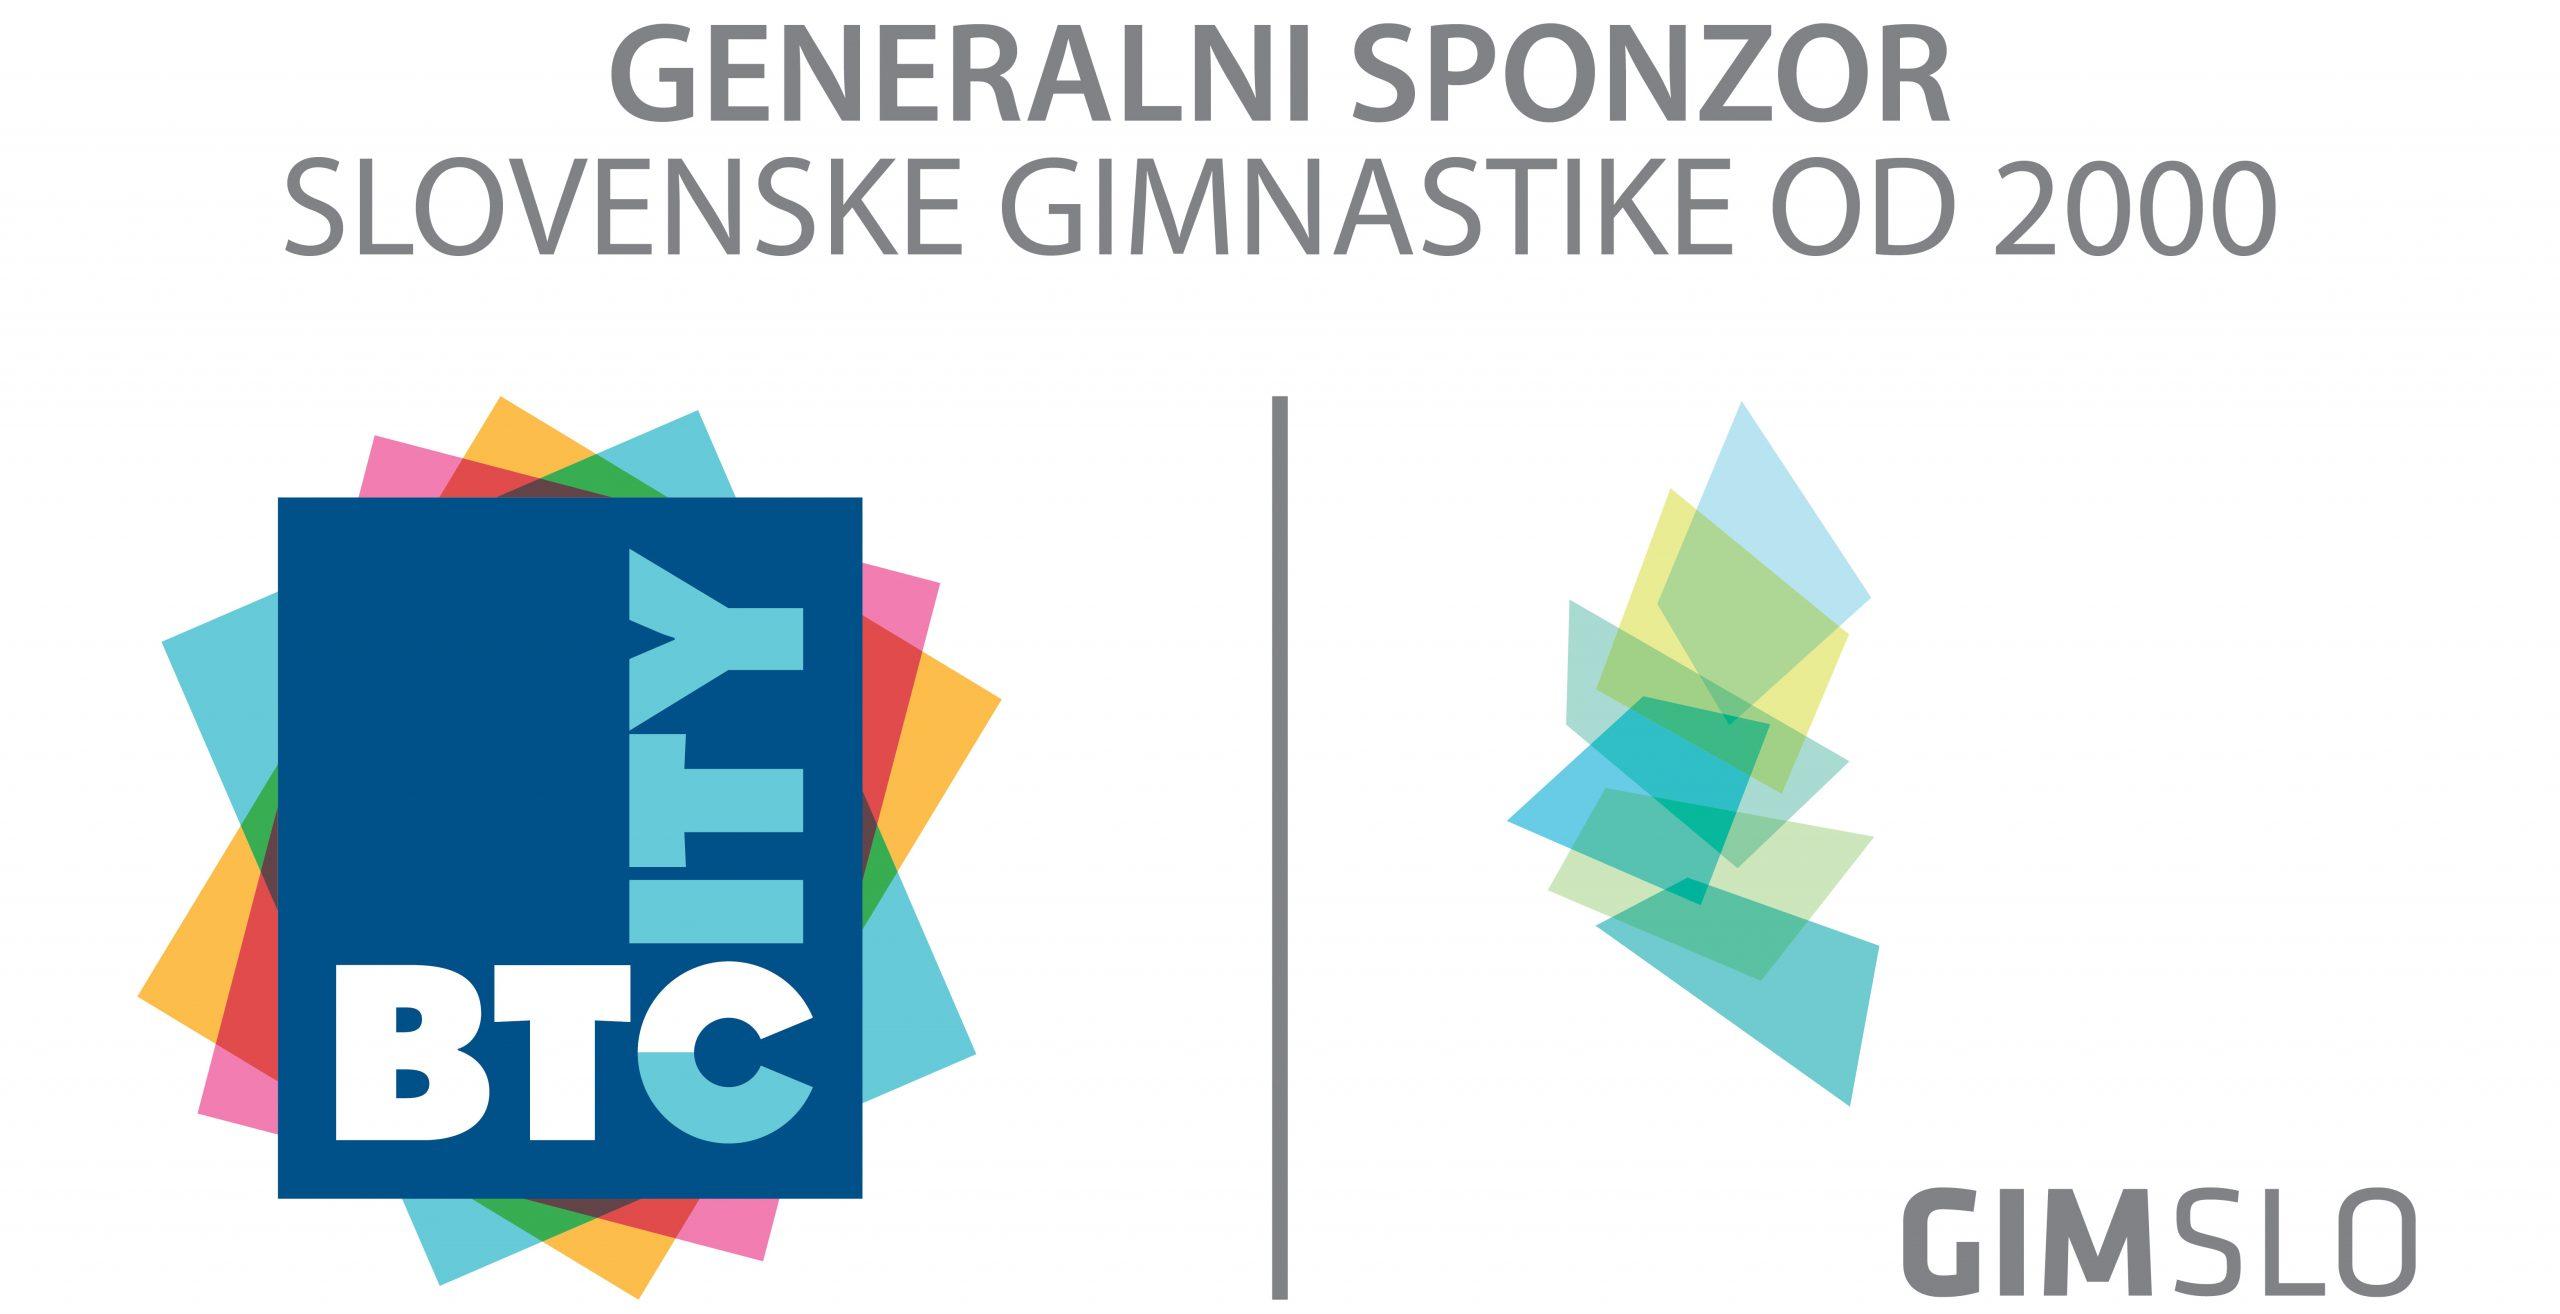 btc_ponosni sponzor